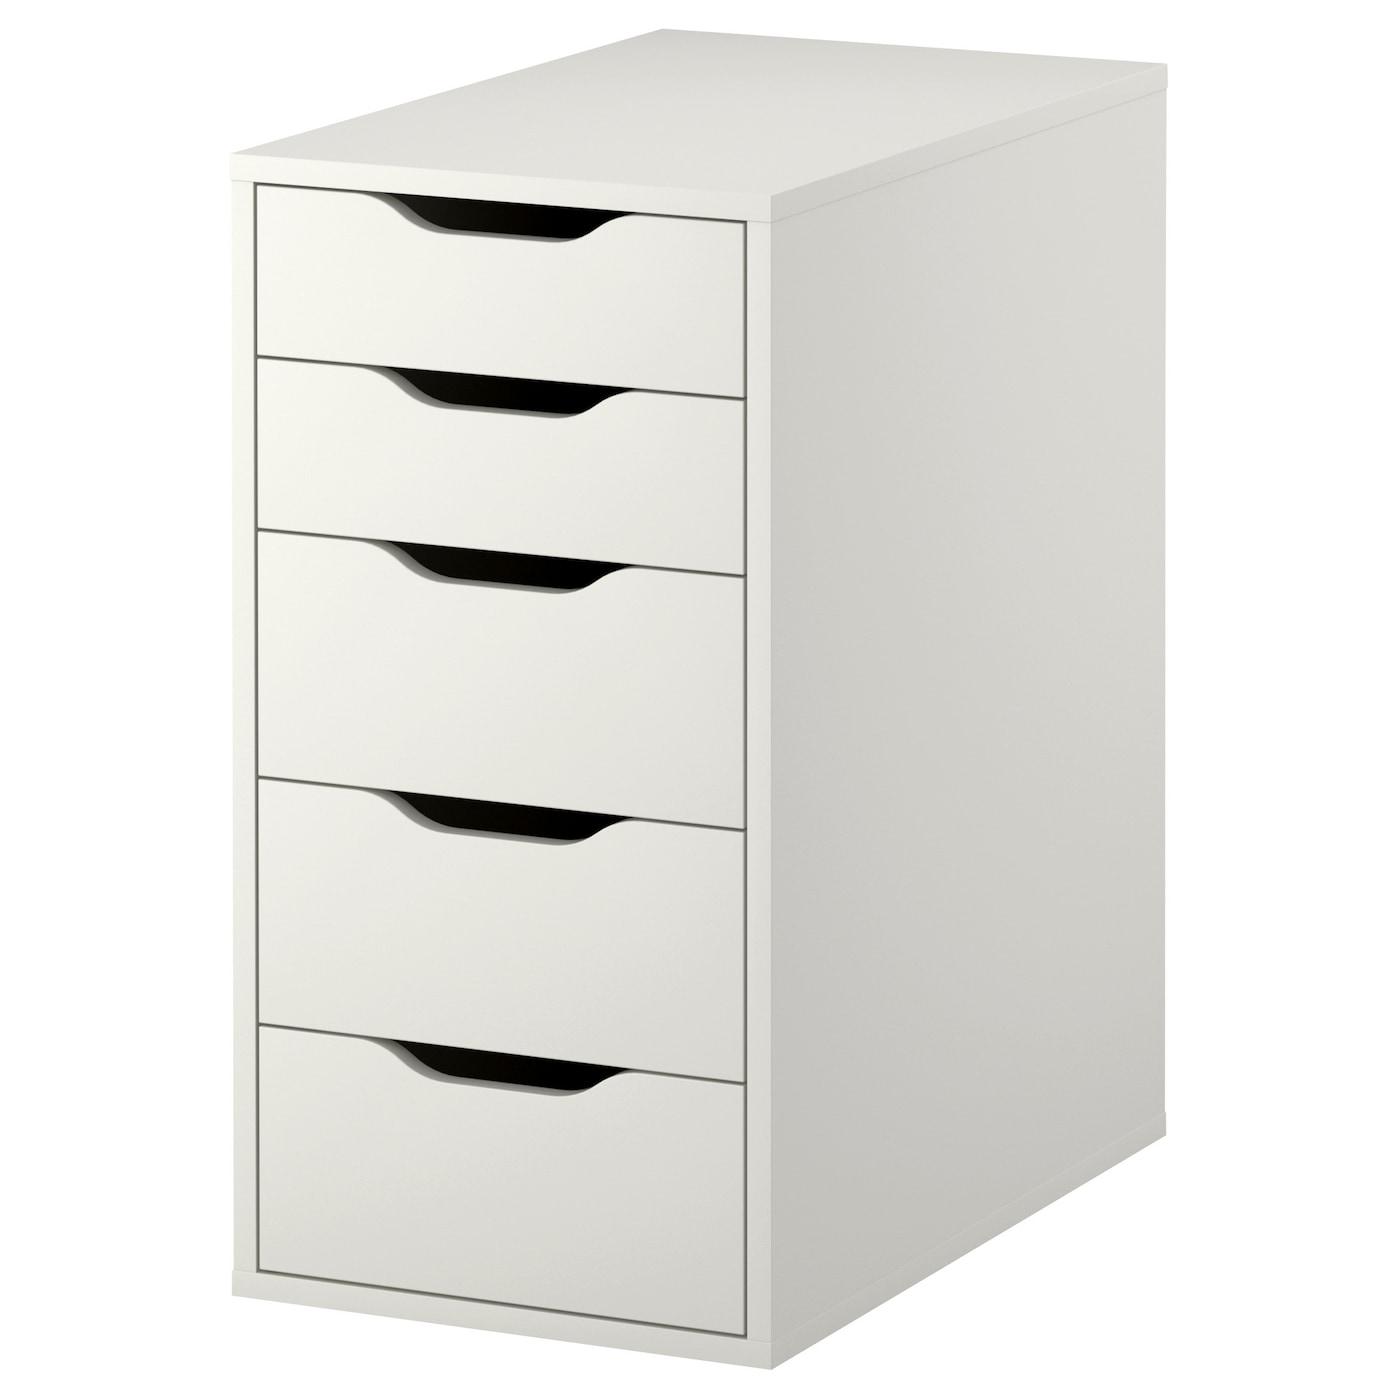 Alex Caisson Tiroirs Blanc 36×70 Cm Ikea # Meuble Tiroir